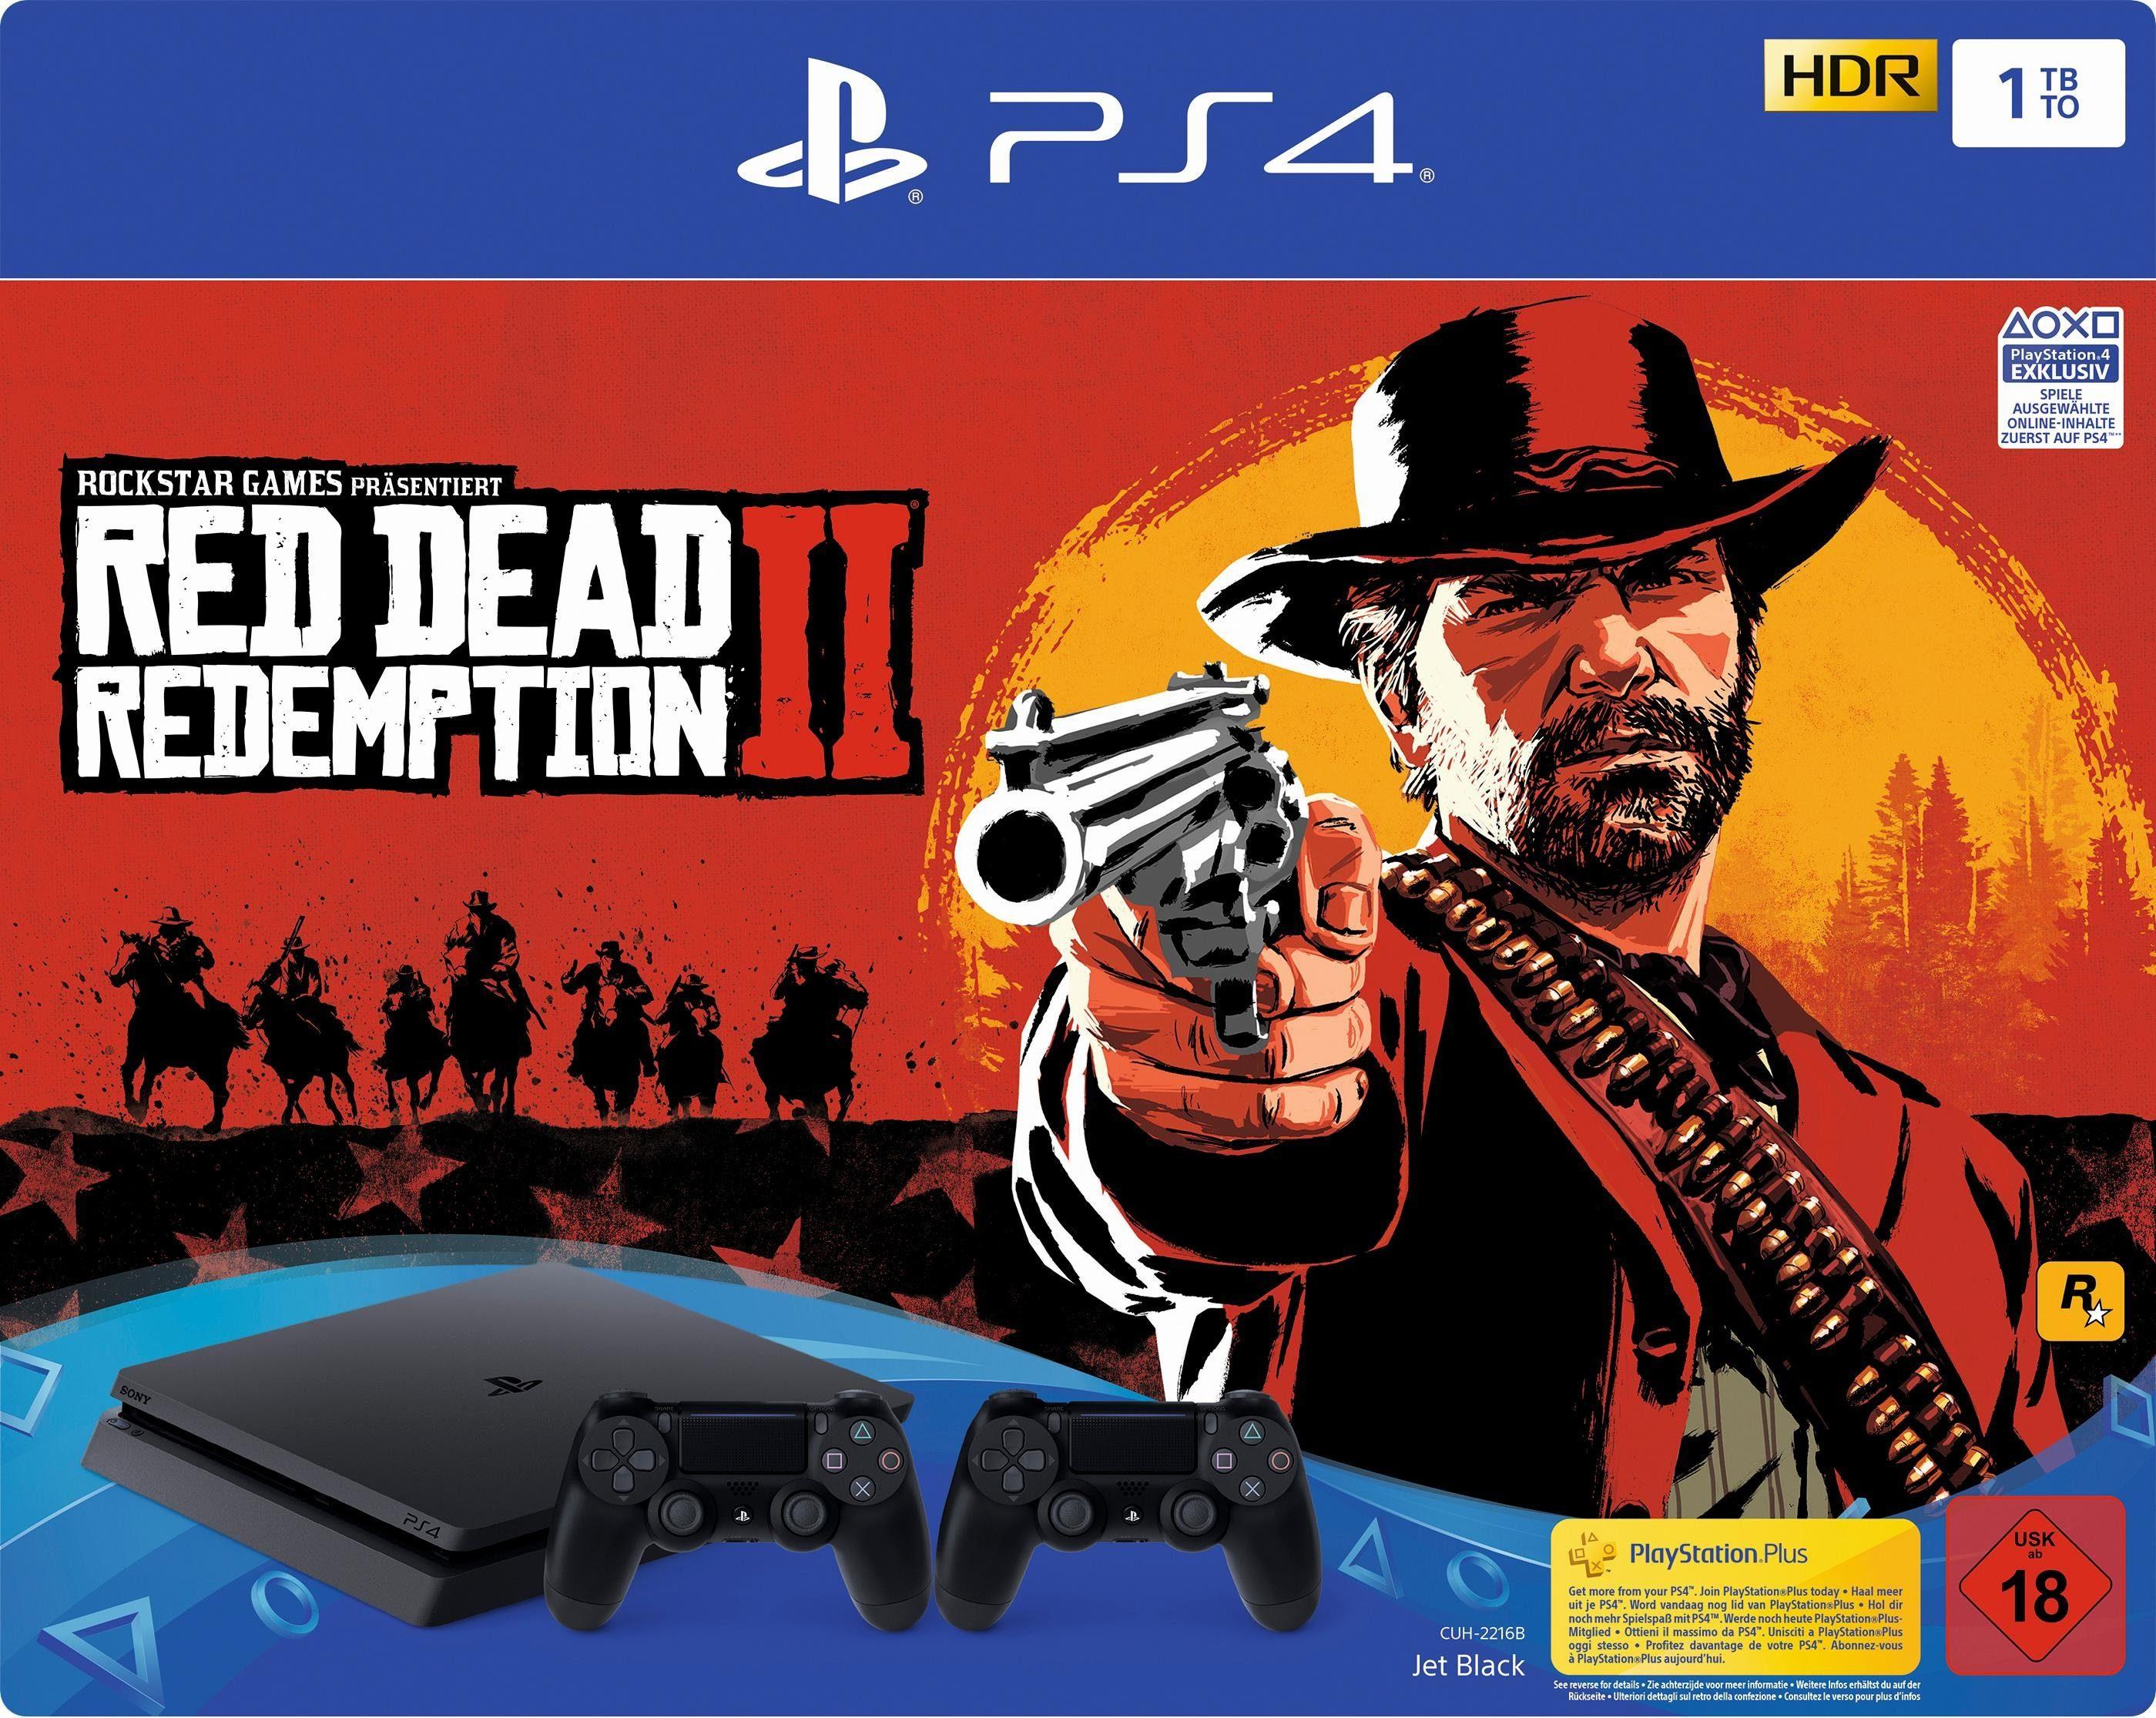 PlayStation 4 Slim (PS4 Slim) 1TB (Bundle, inkl. Red Dead Redemption 2 + 2 Wireless-Controller)